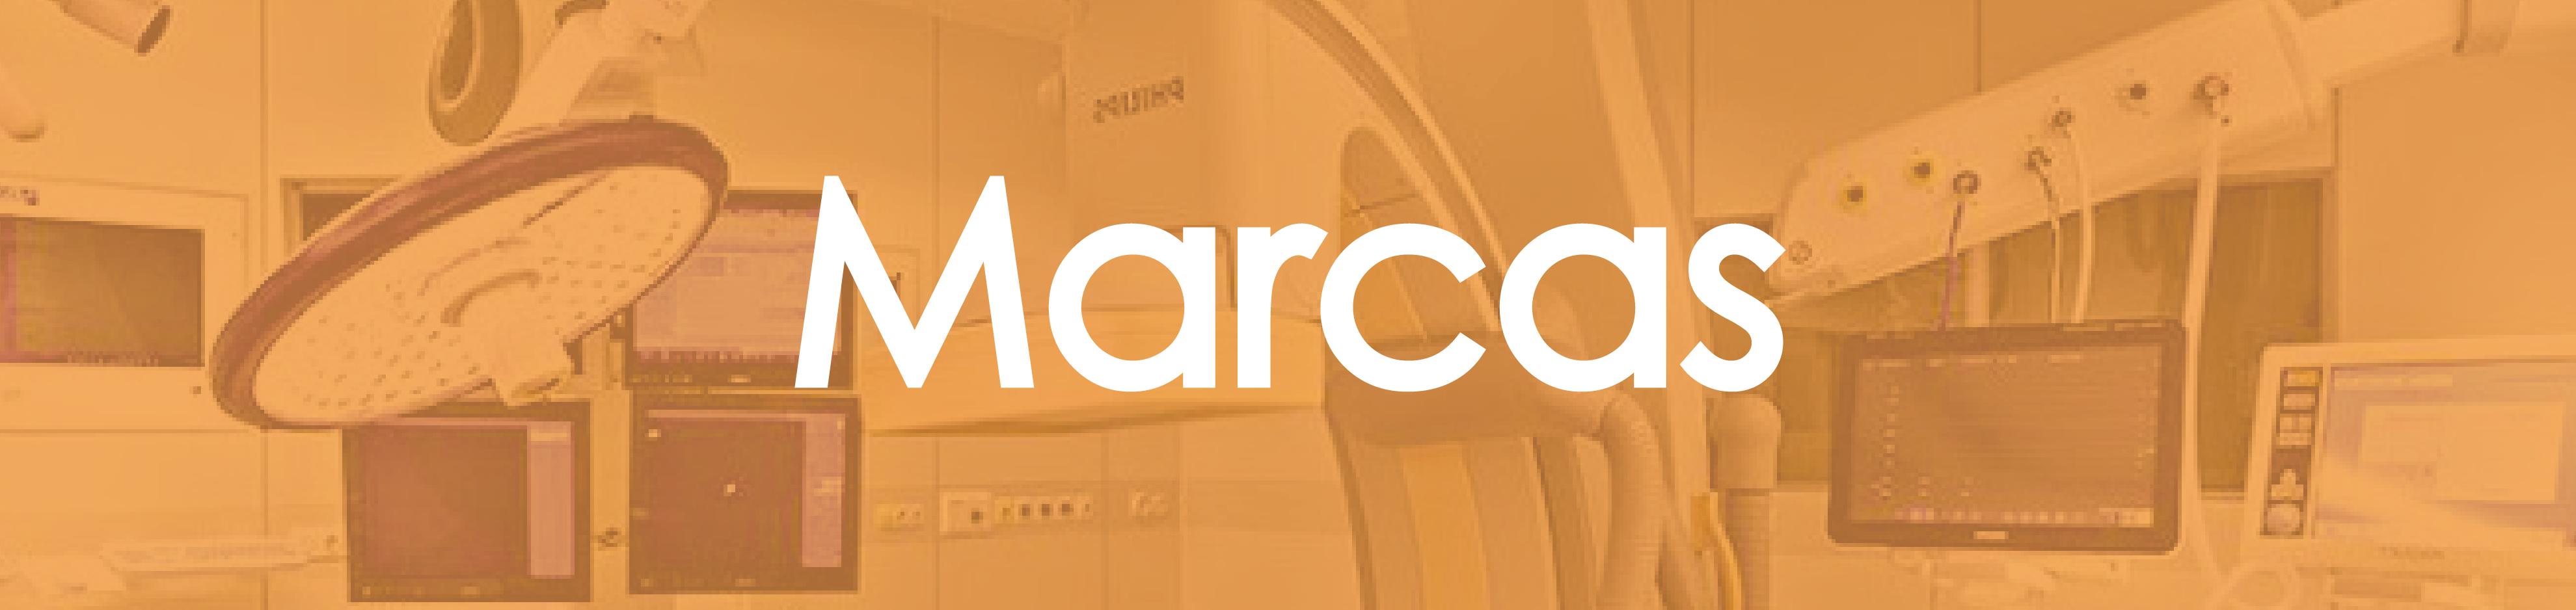 MarcasElectromedicina